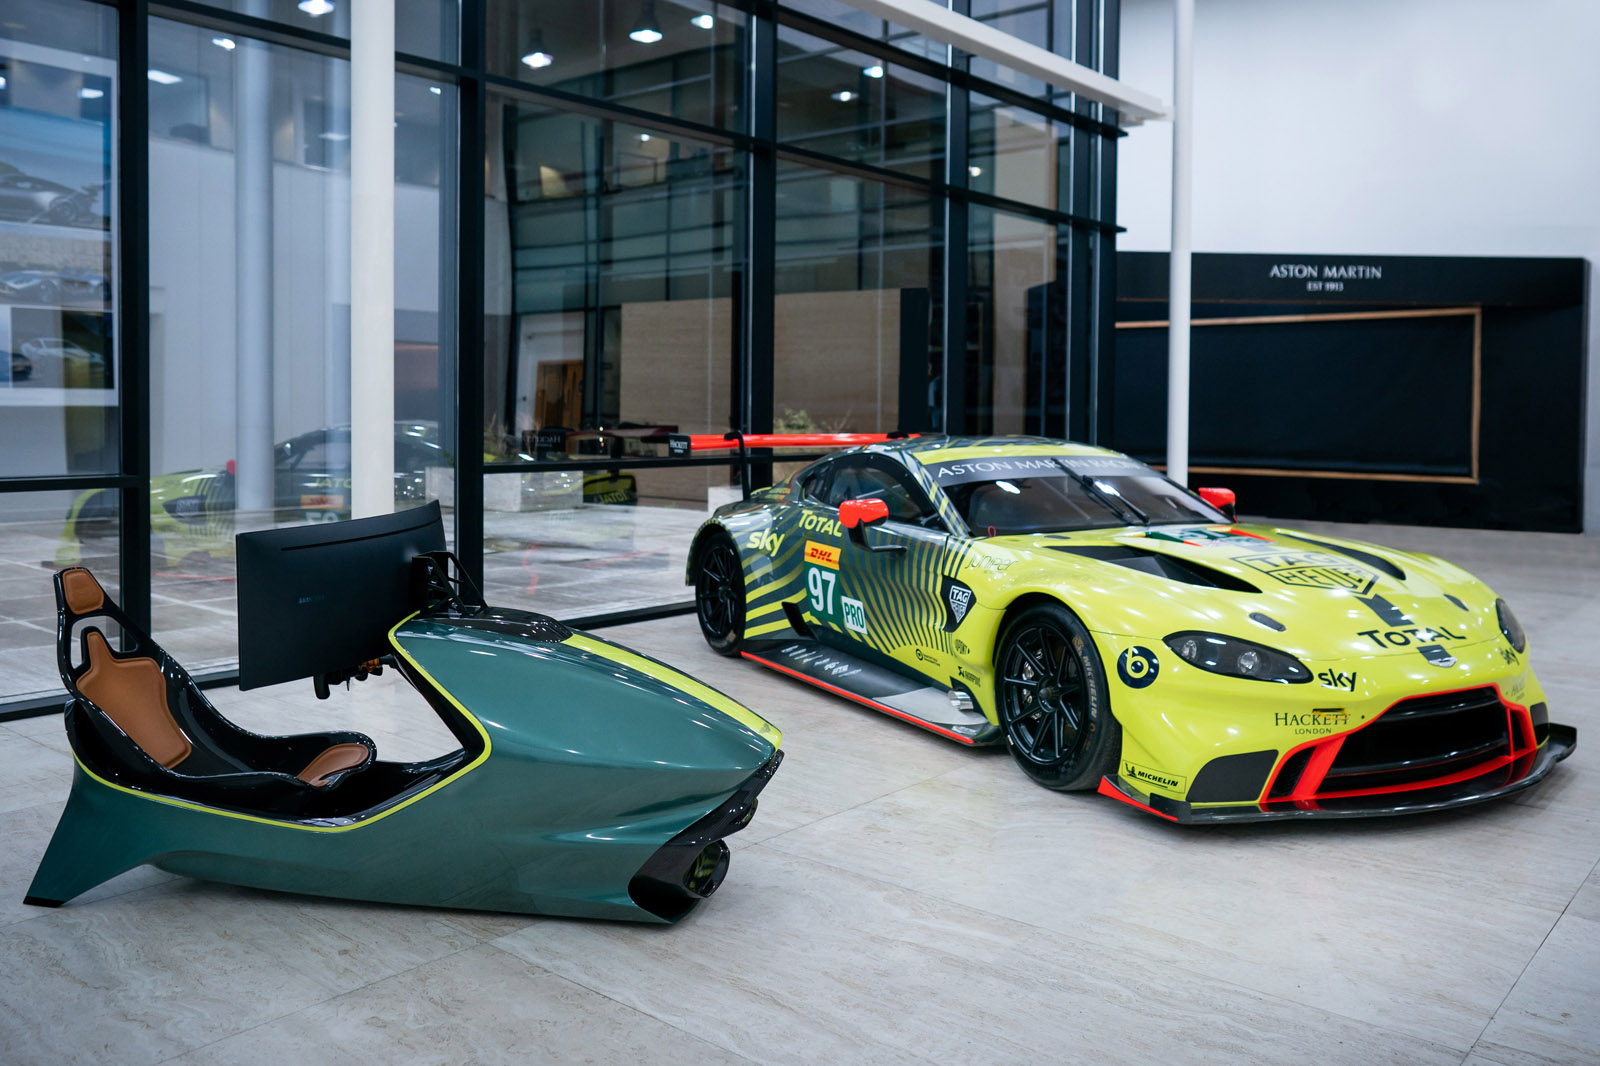 Testing Darren Turner's new Aston Martin simulator | Autocar